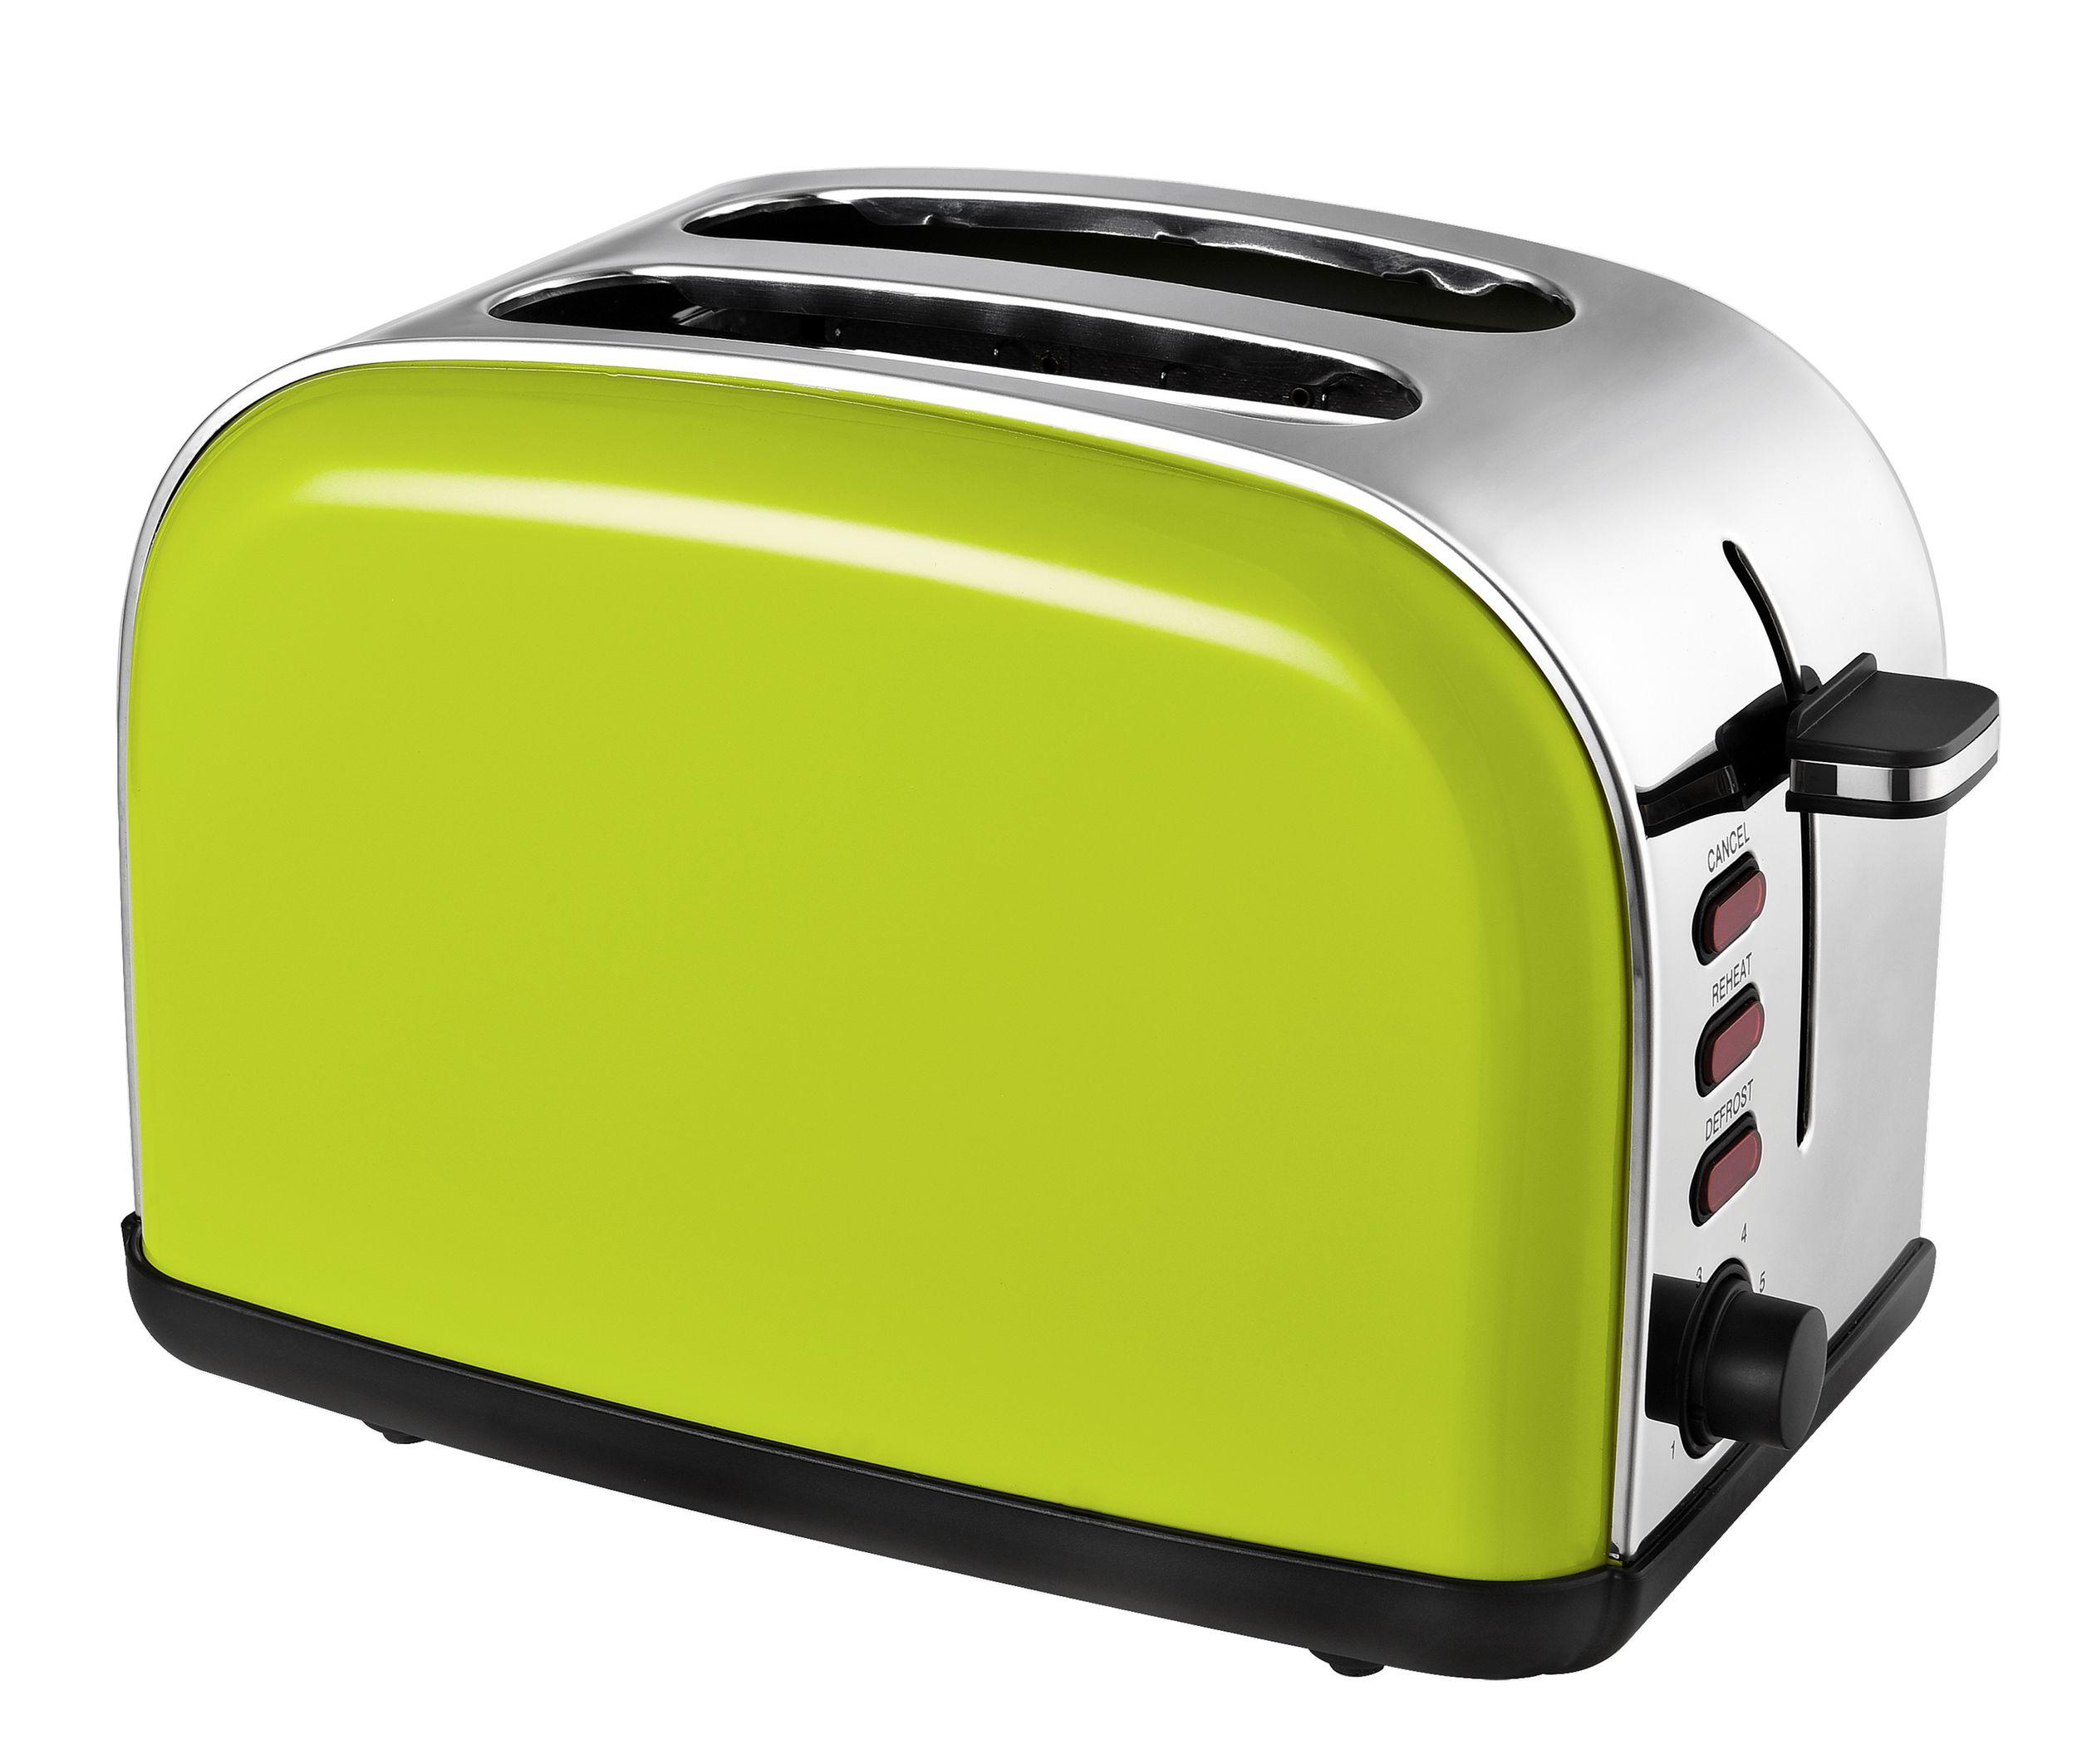 2-Scheiben-Edelstahltoaster Brotröster apfelgrün (Karton beschädigt)*92988 Bild 3